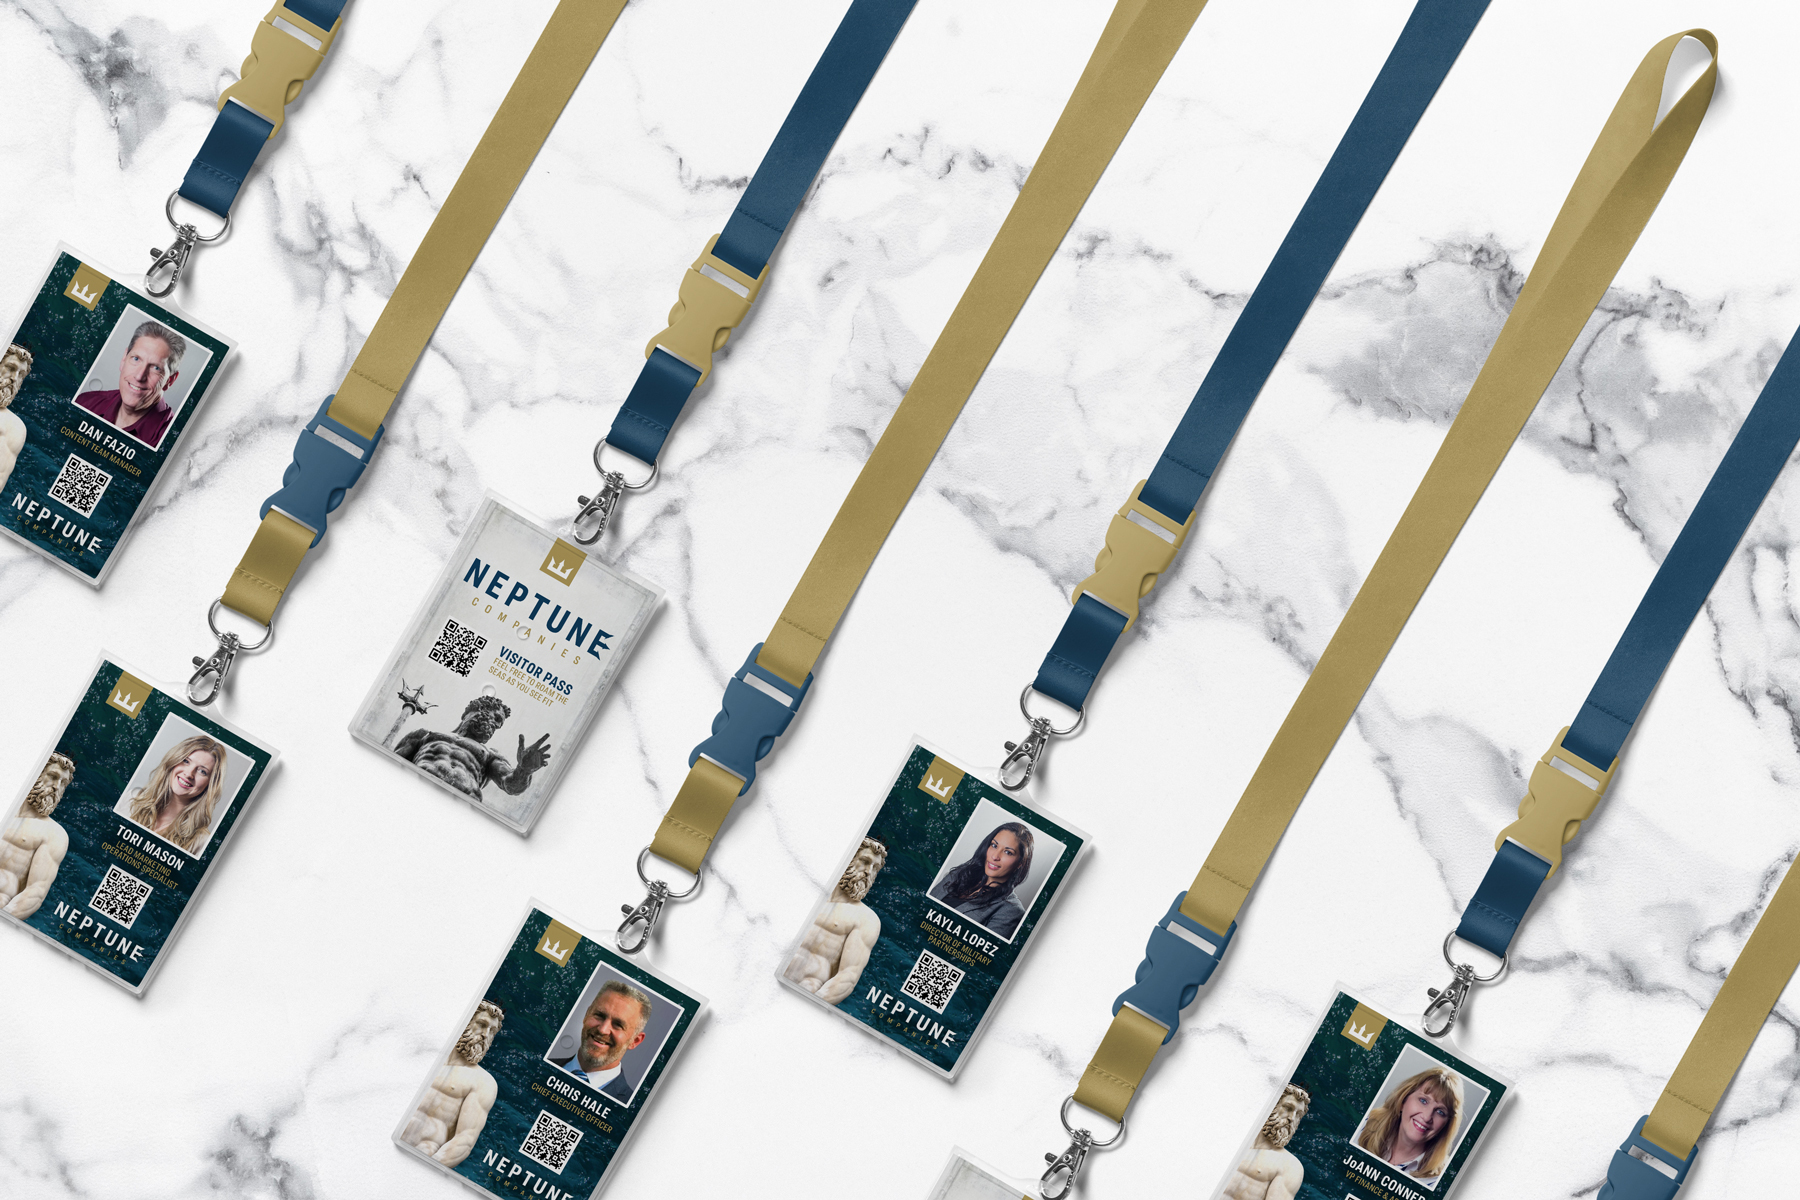 Neptune Companies' ID Laynard